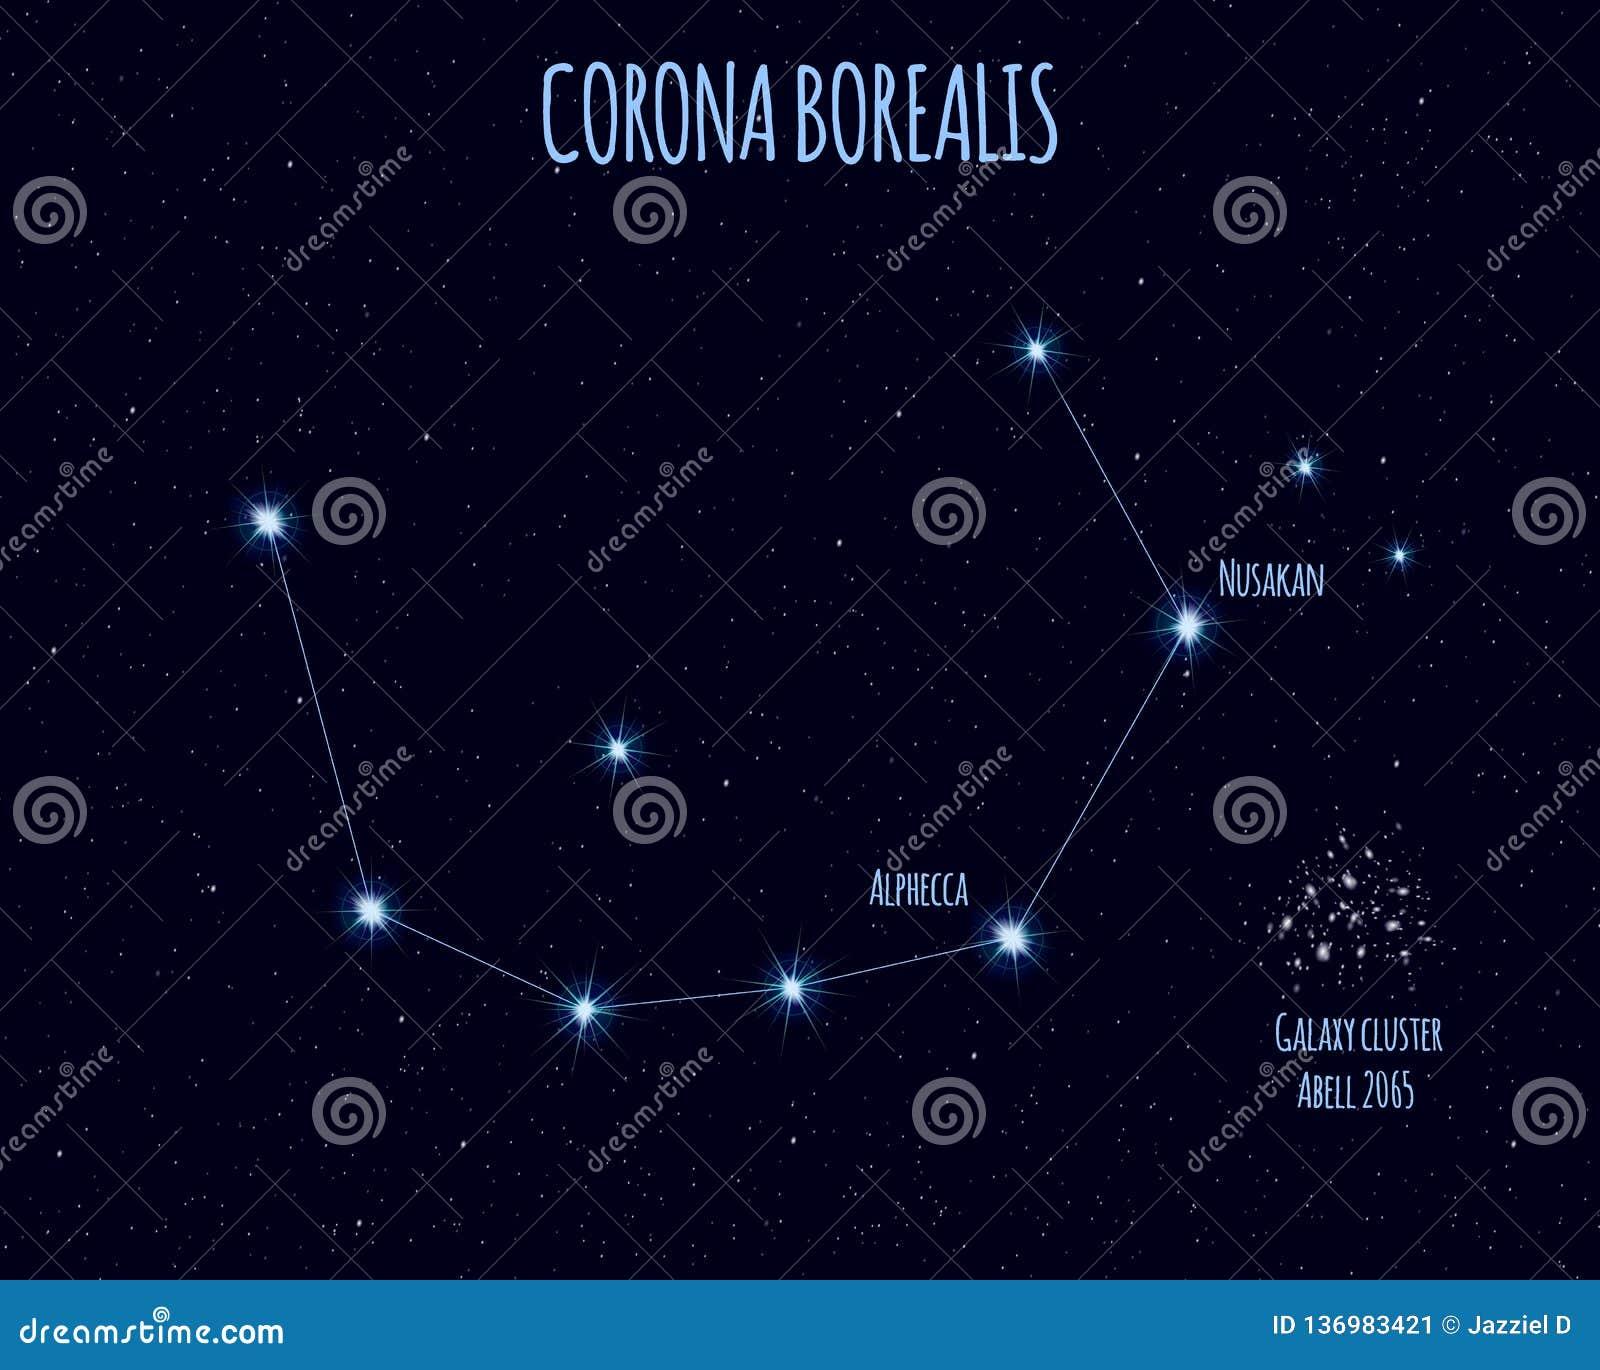 Corona Borealis Constellation Vector Illustration With The Names Of Basic Stars Stock Vector Illustration Of Glitter Cosmic 136983421